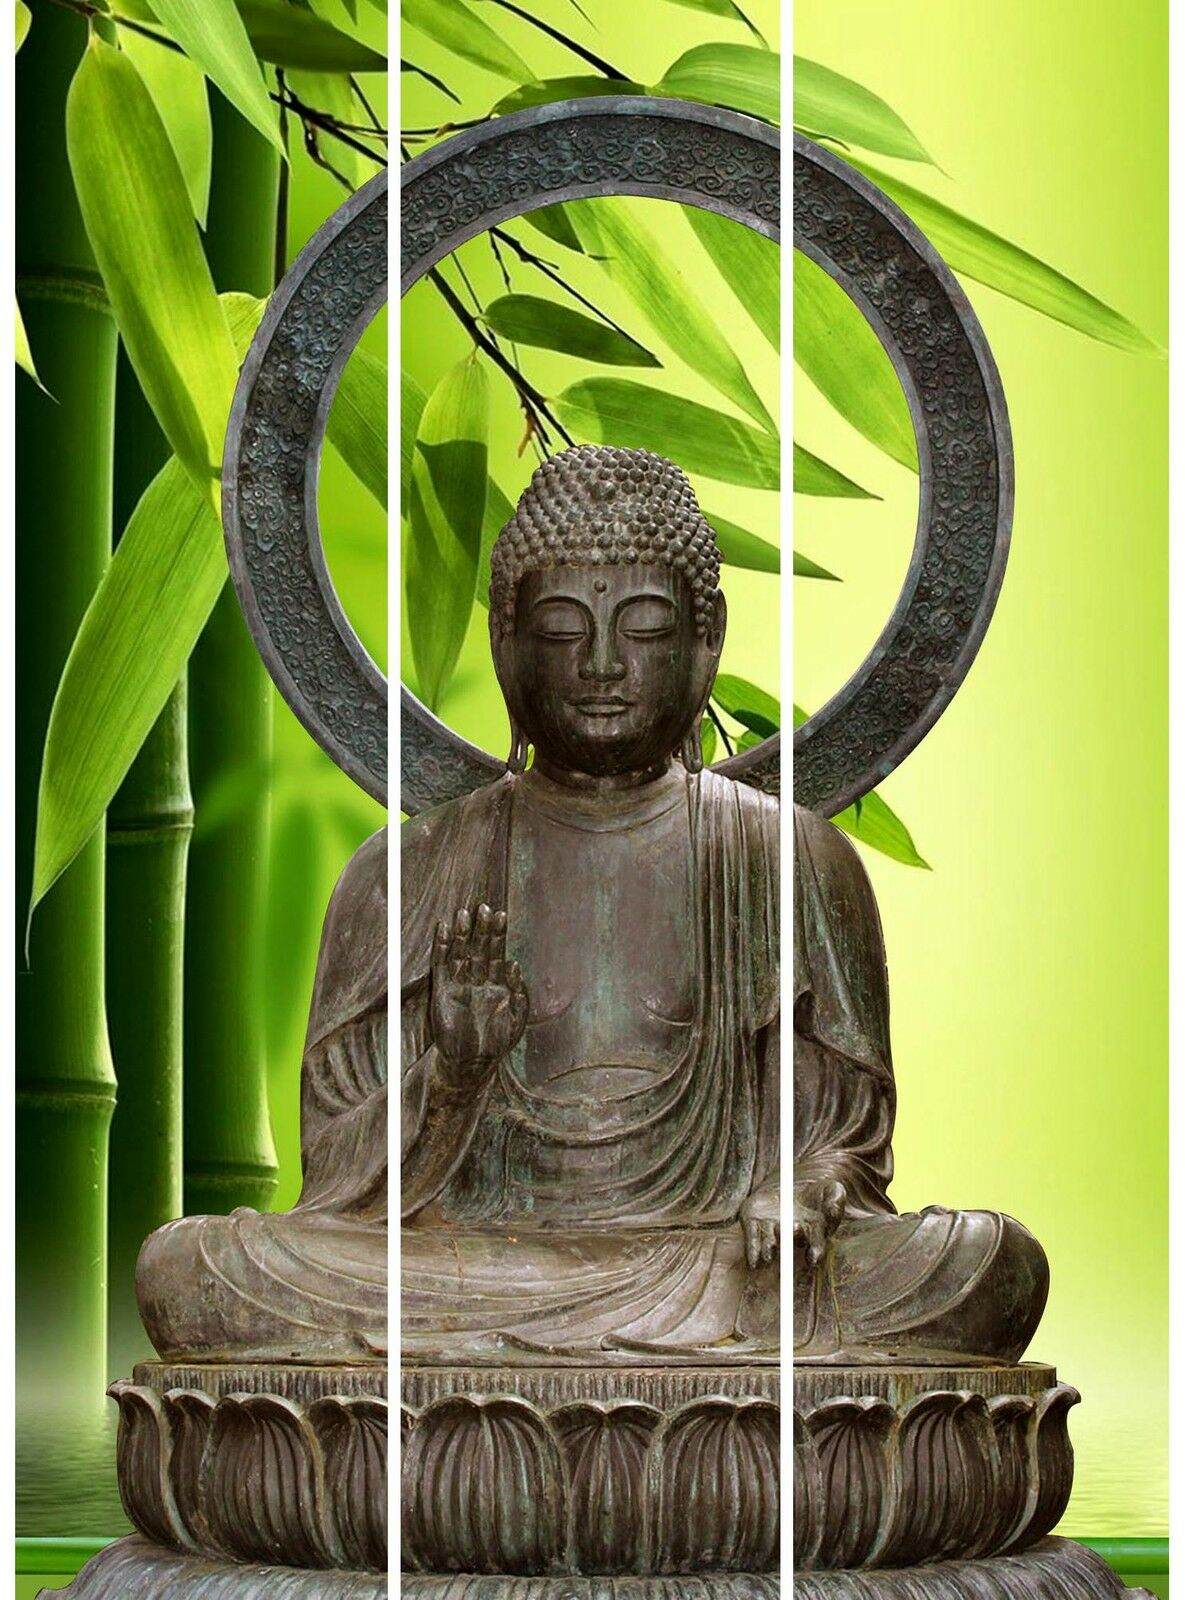 8041 Raumteiler Silence Paravent Trennwand Sichtschutz Hofmann 2 Motive Buddha